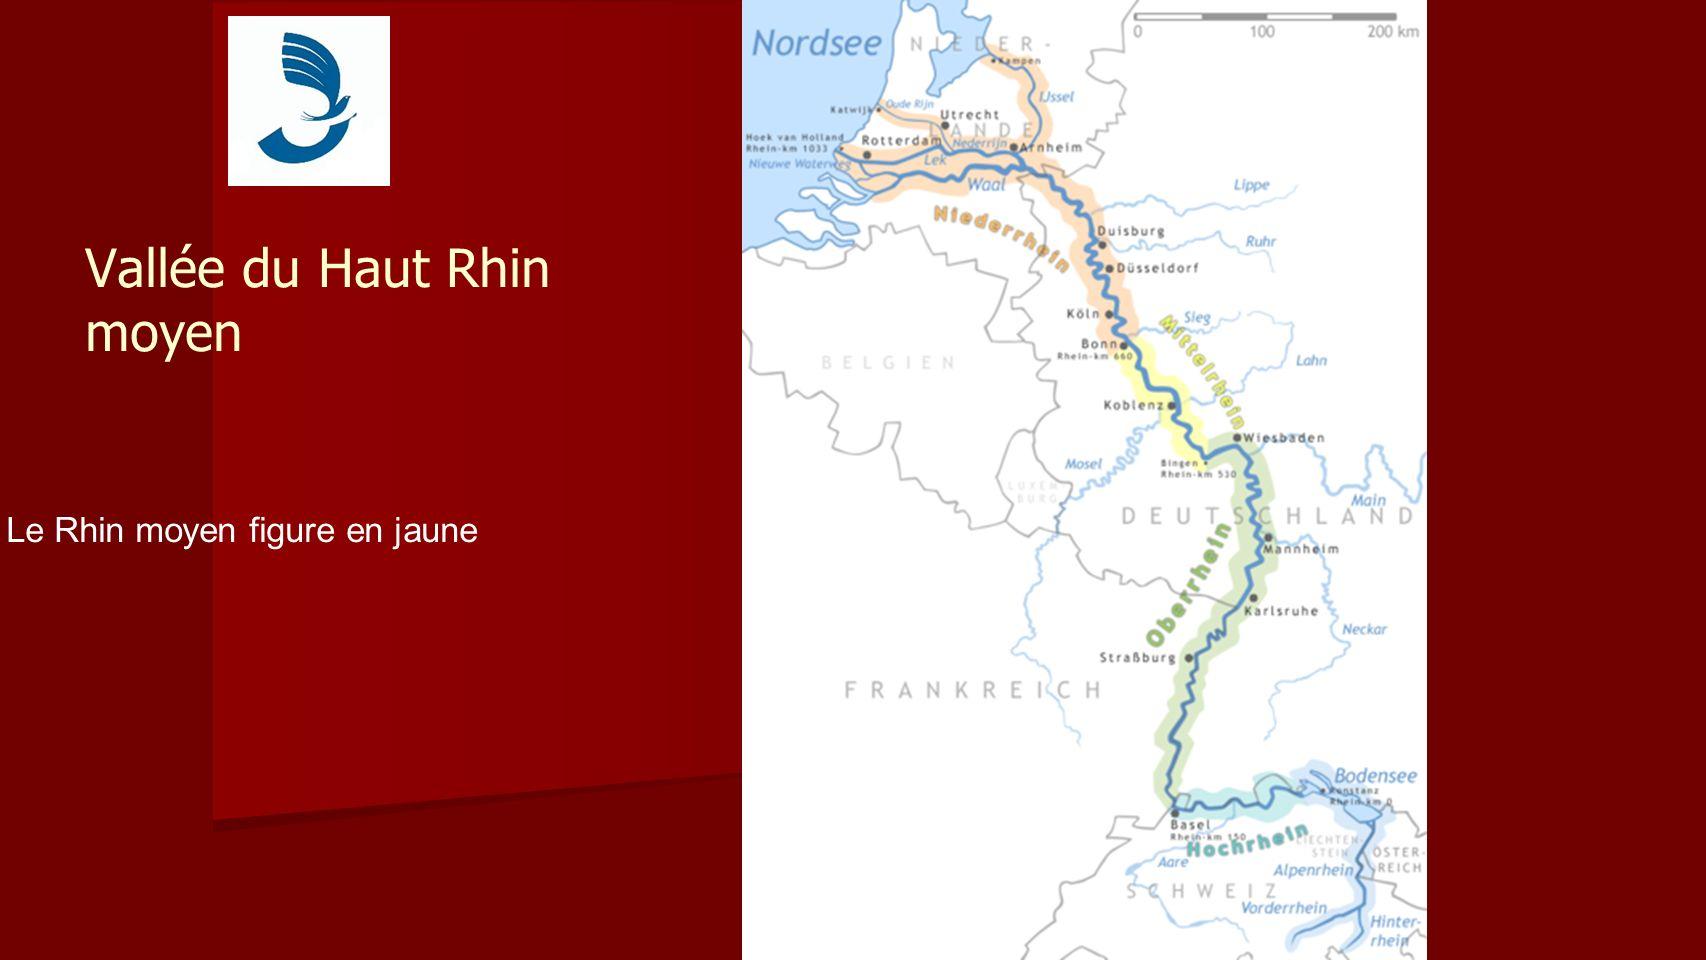 Vallée du Haut Rhin moyen Le Rhin moyen figure en jaune